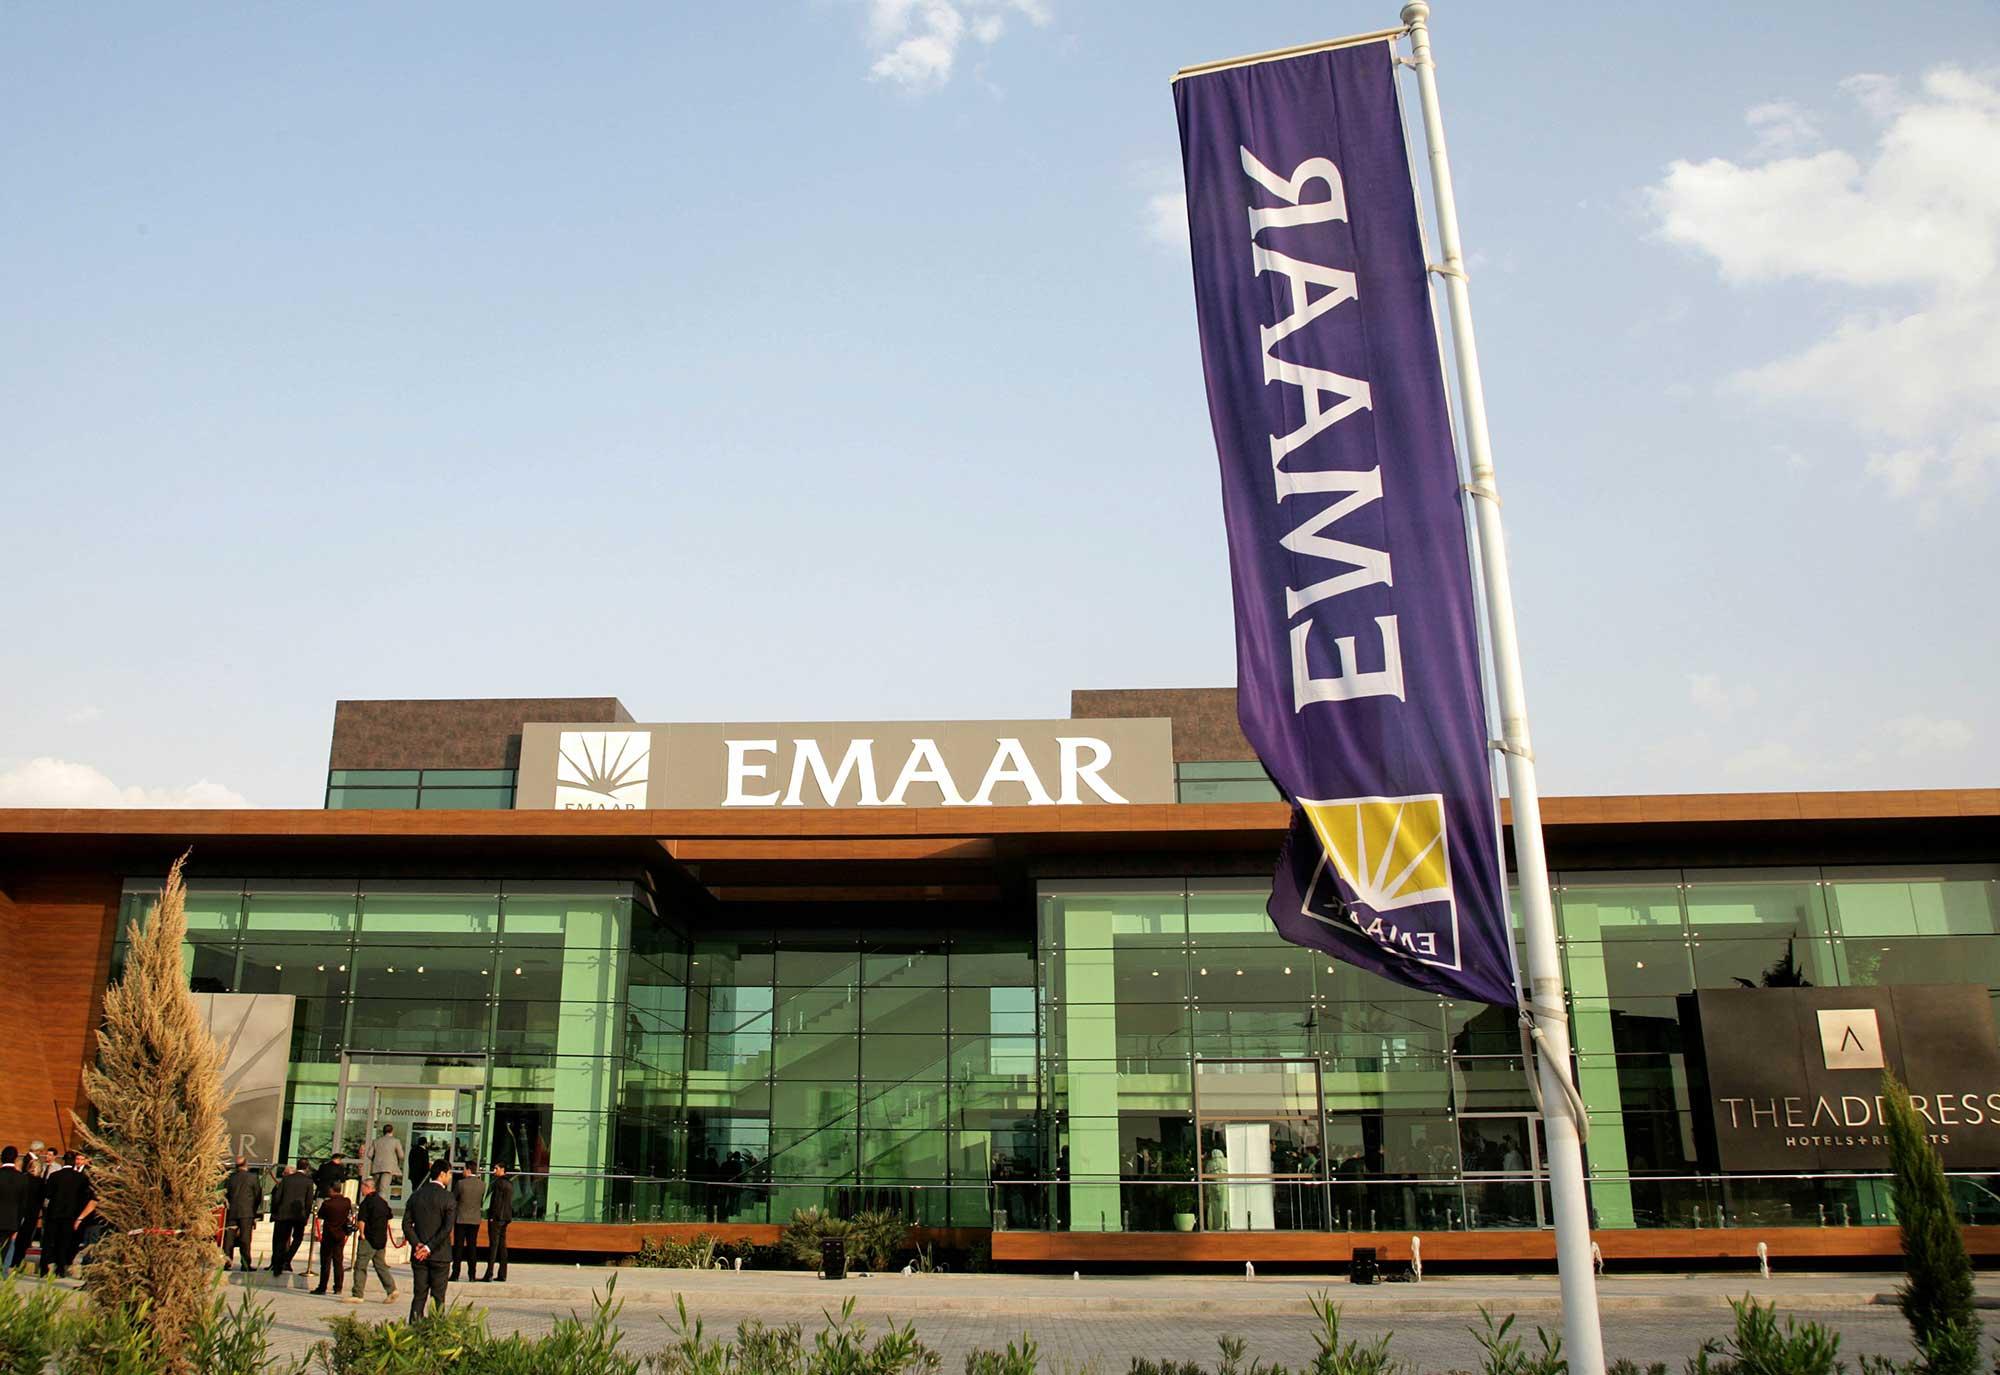 Emaar Development sales rise to $1.6bn in Q1 2019